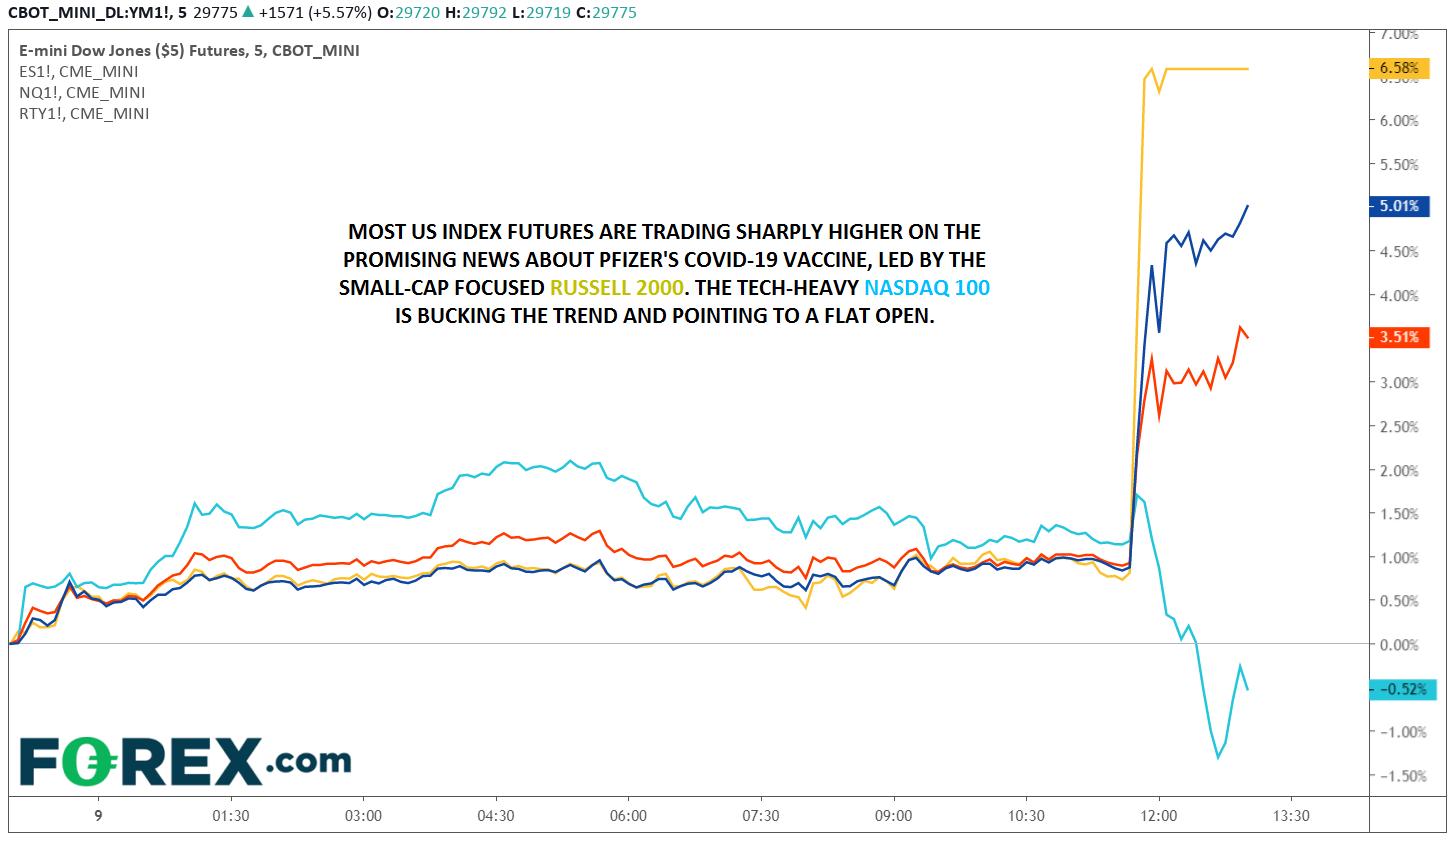 E-mini Dow Jones Chart